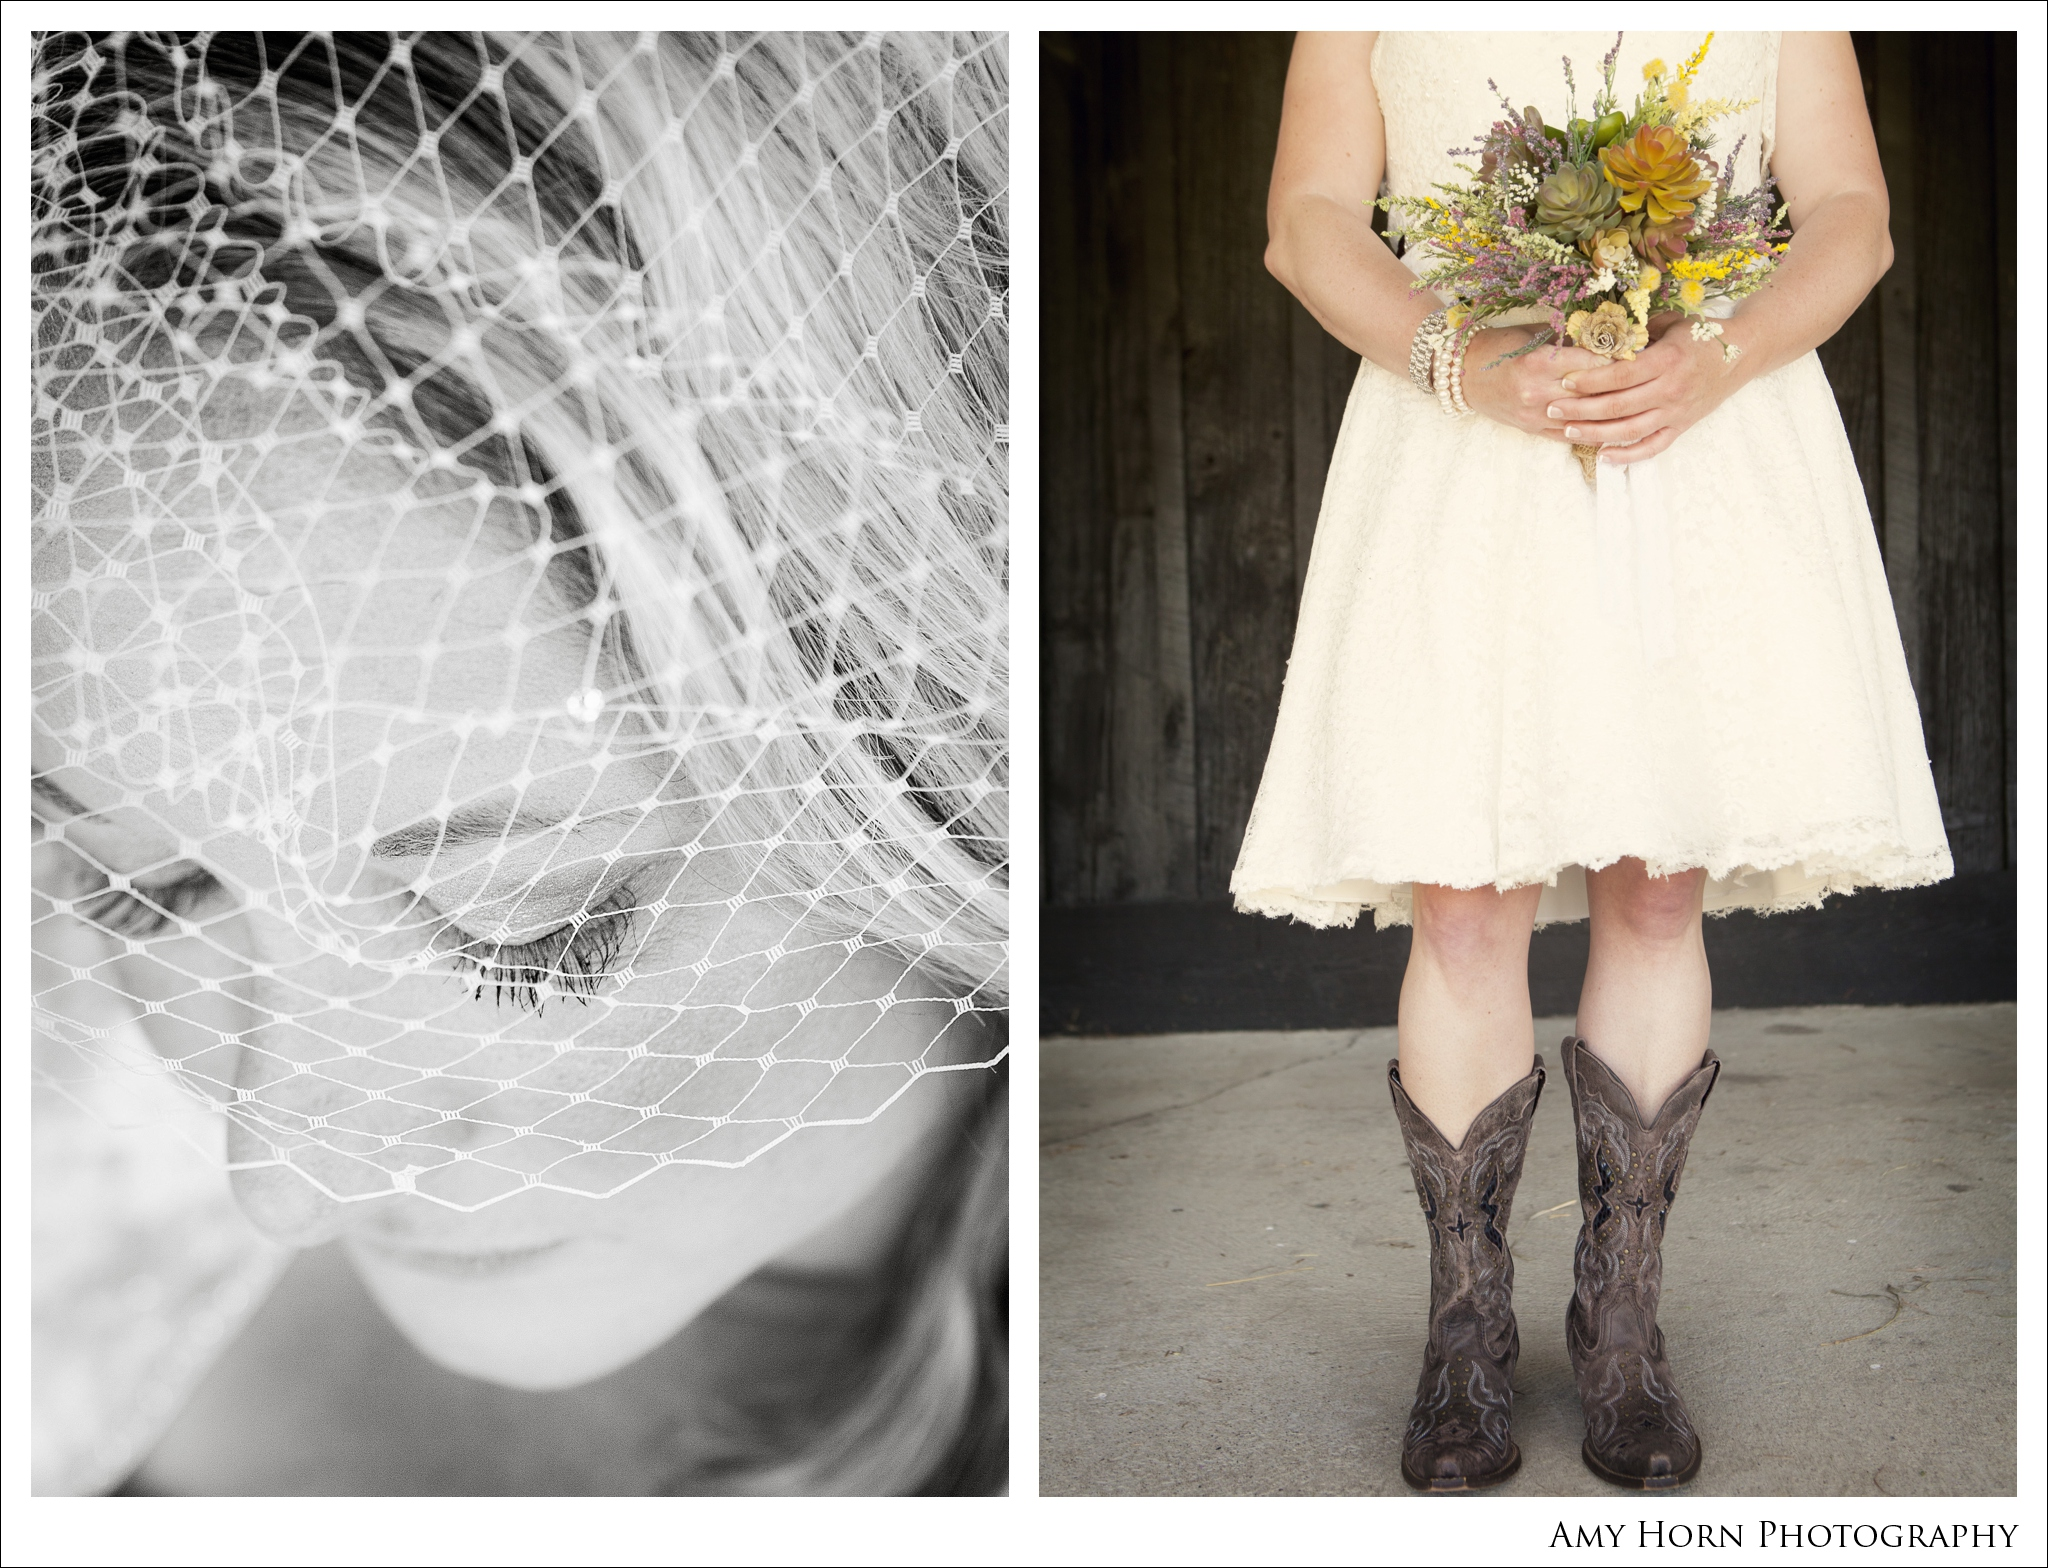 cincinnati wedding photographer, lawrenceburg indiana wedding photographer, aurora indiana engagement, dillsboro indiana, barn wedding, madison indiana wedding, photographer, batesville indiana photographer036.jpg